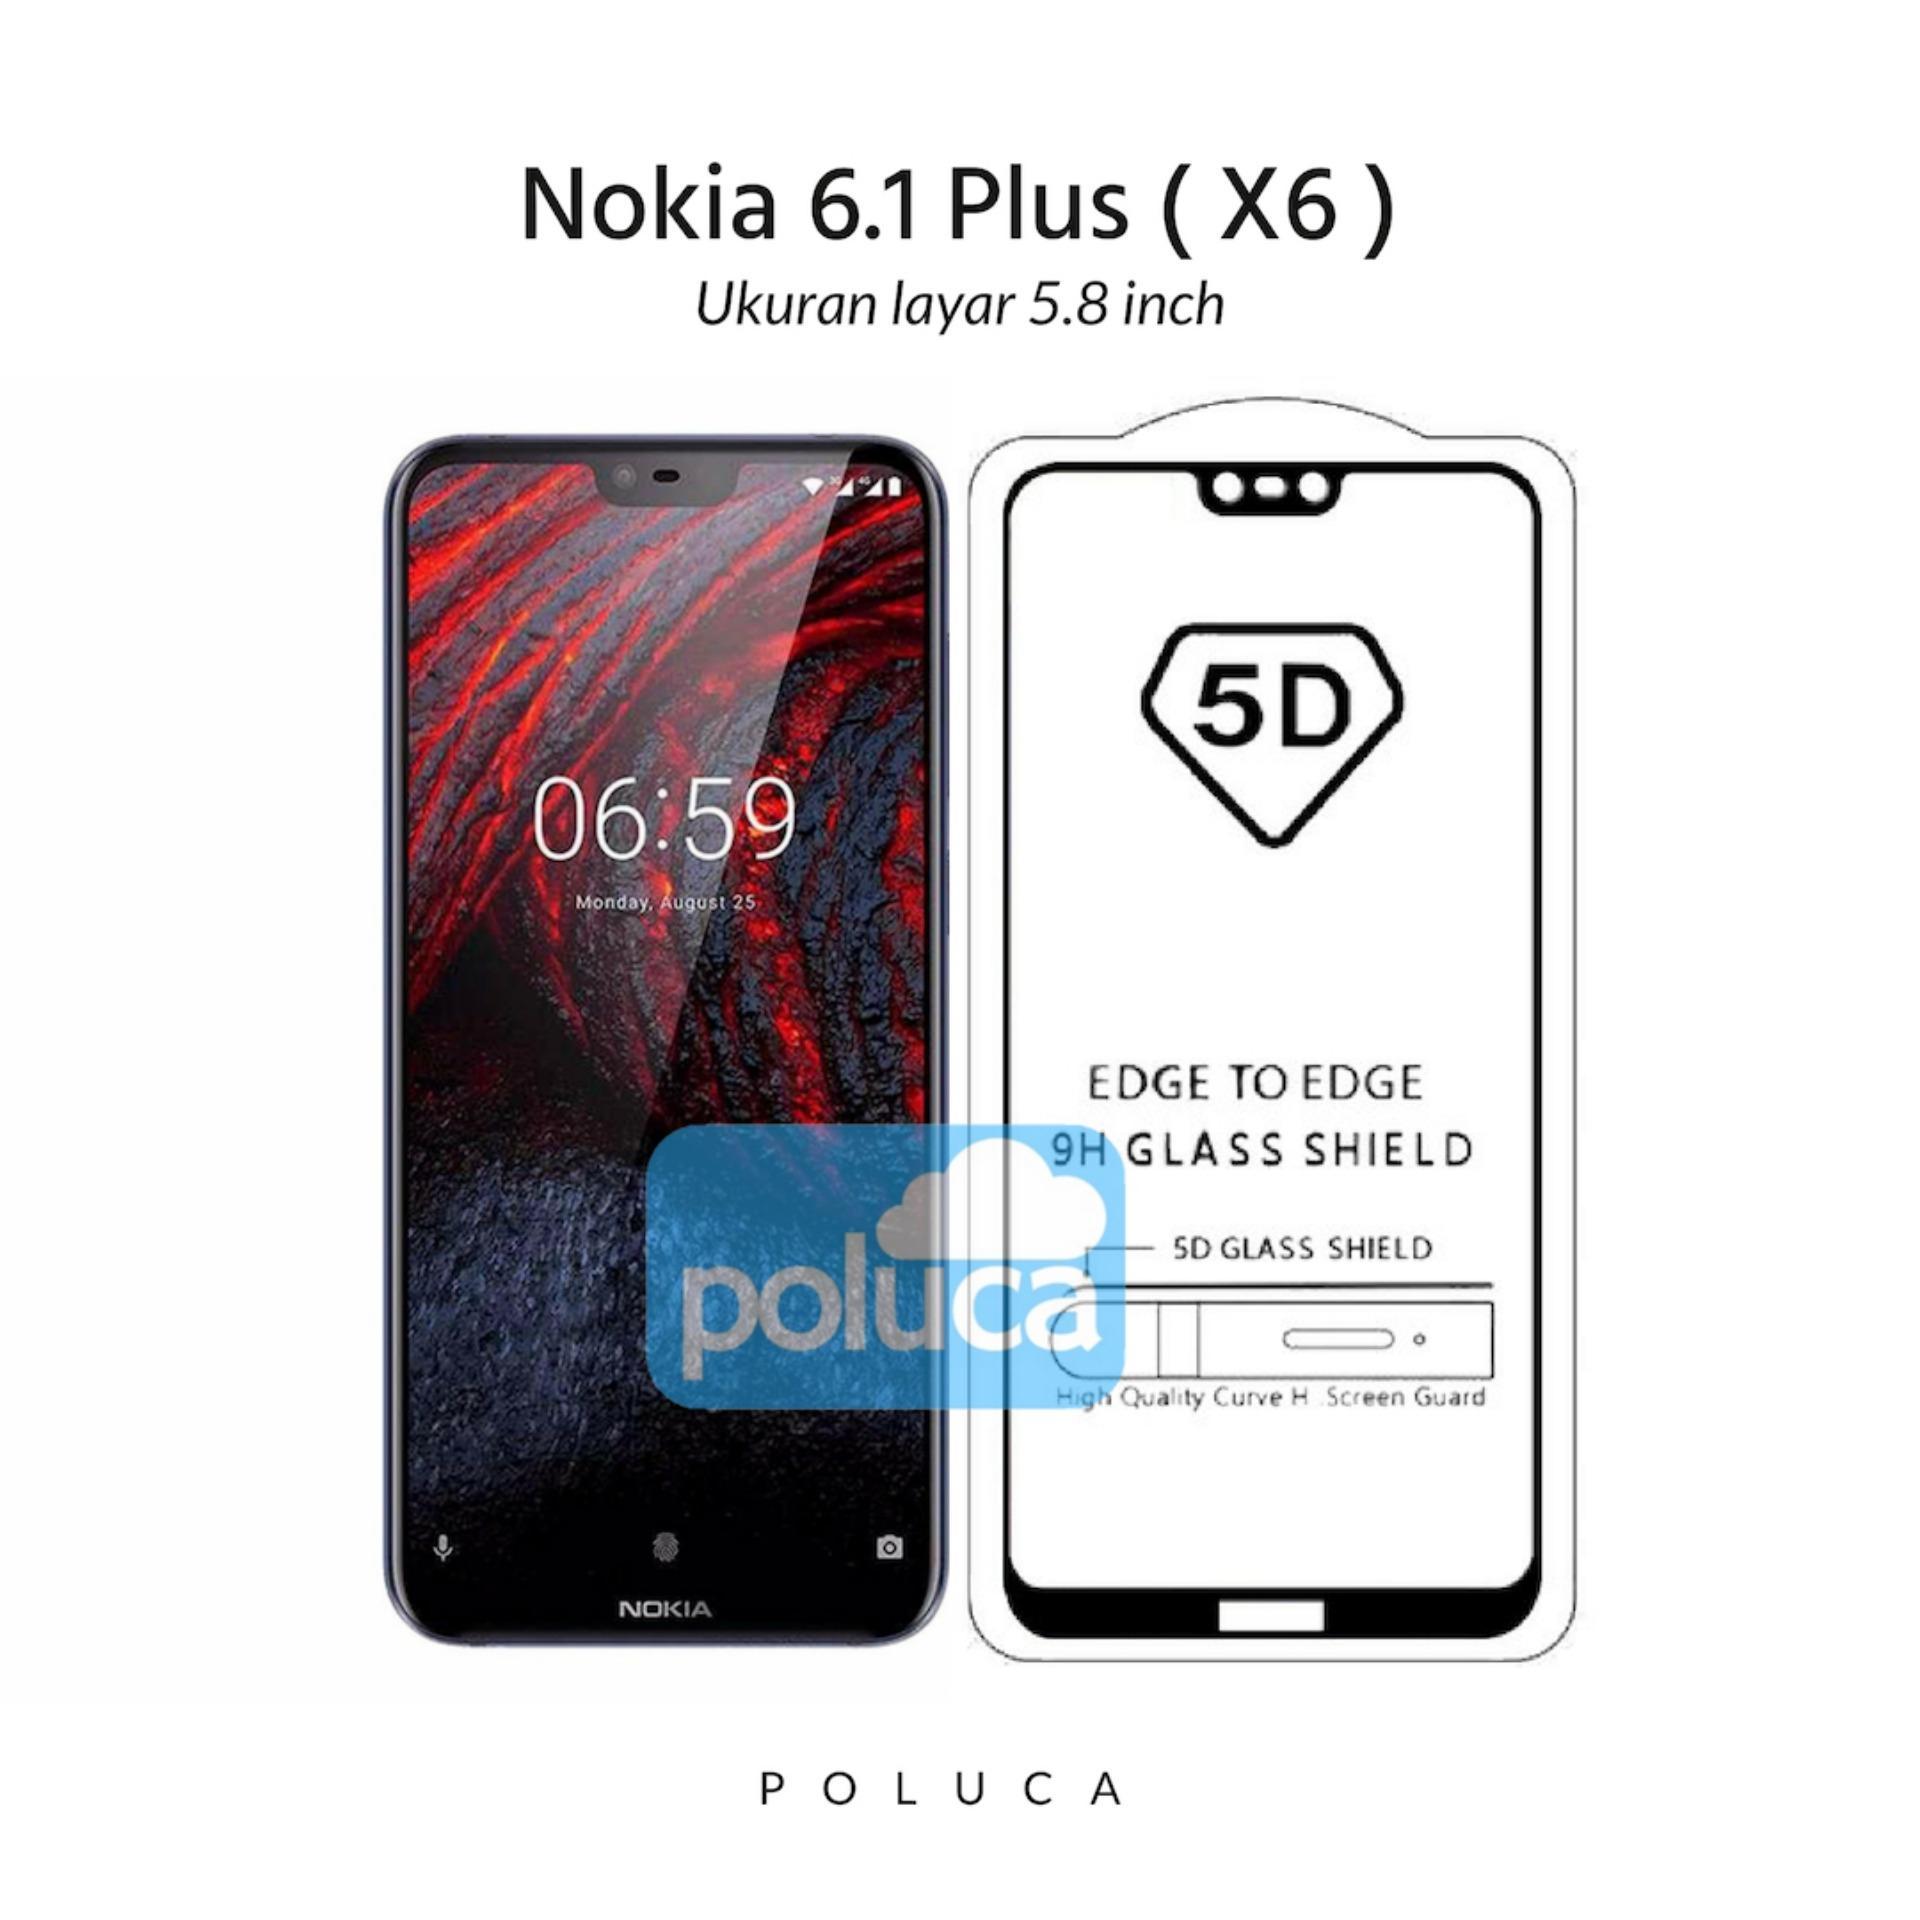 Poluca 5D Full Cover Tempered Glass Nokia 6.1 Plus ( X6 ) Full Lem Anti Pelangi - Hitam